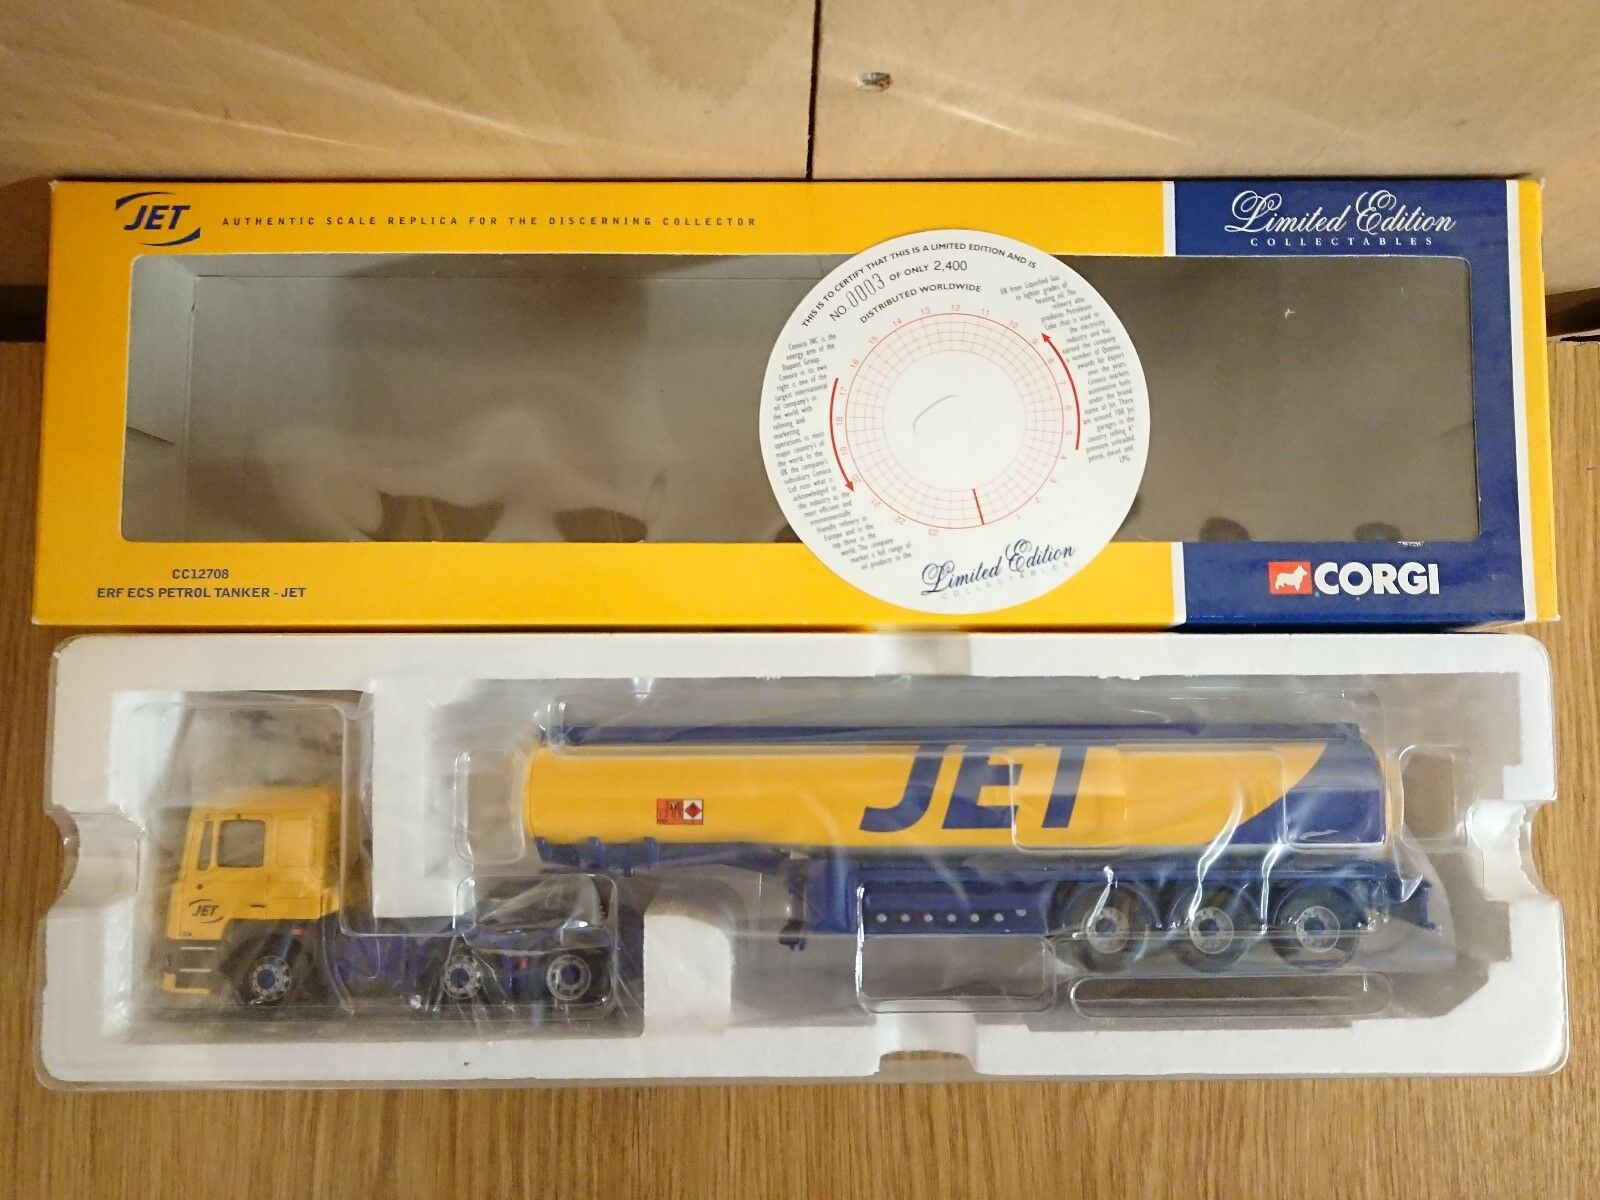 RARE Corgi CC12708 ERF ECS Petrol Tanker JET Ltd Edition No. 0003 of 2400